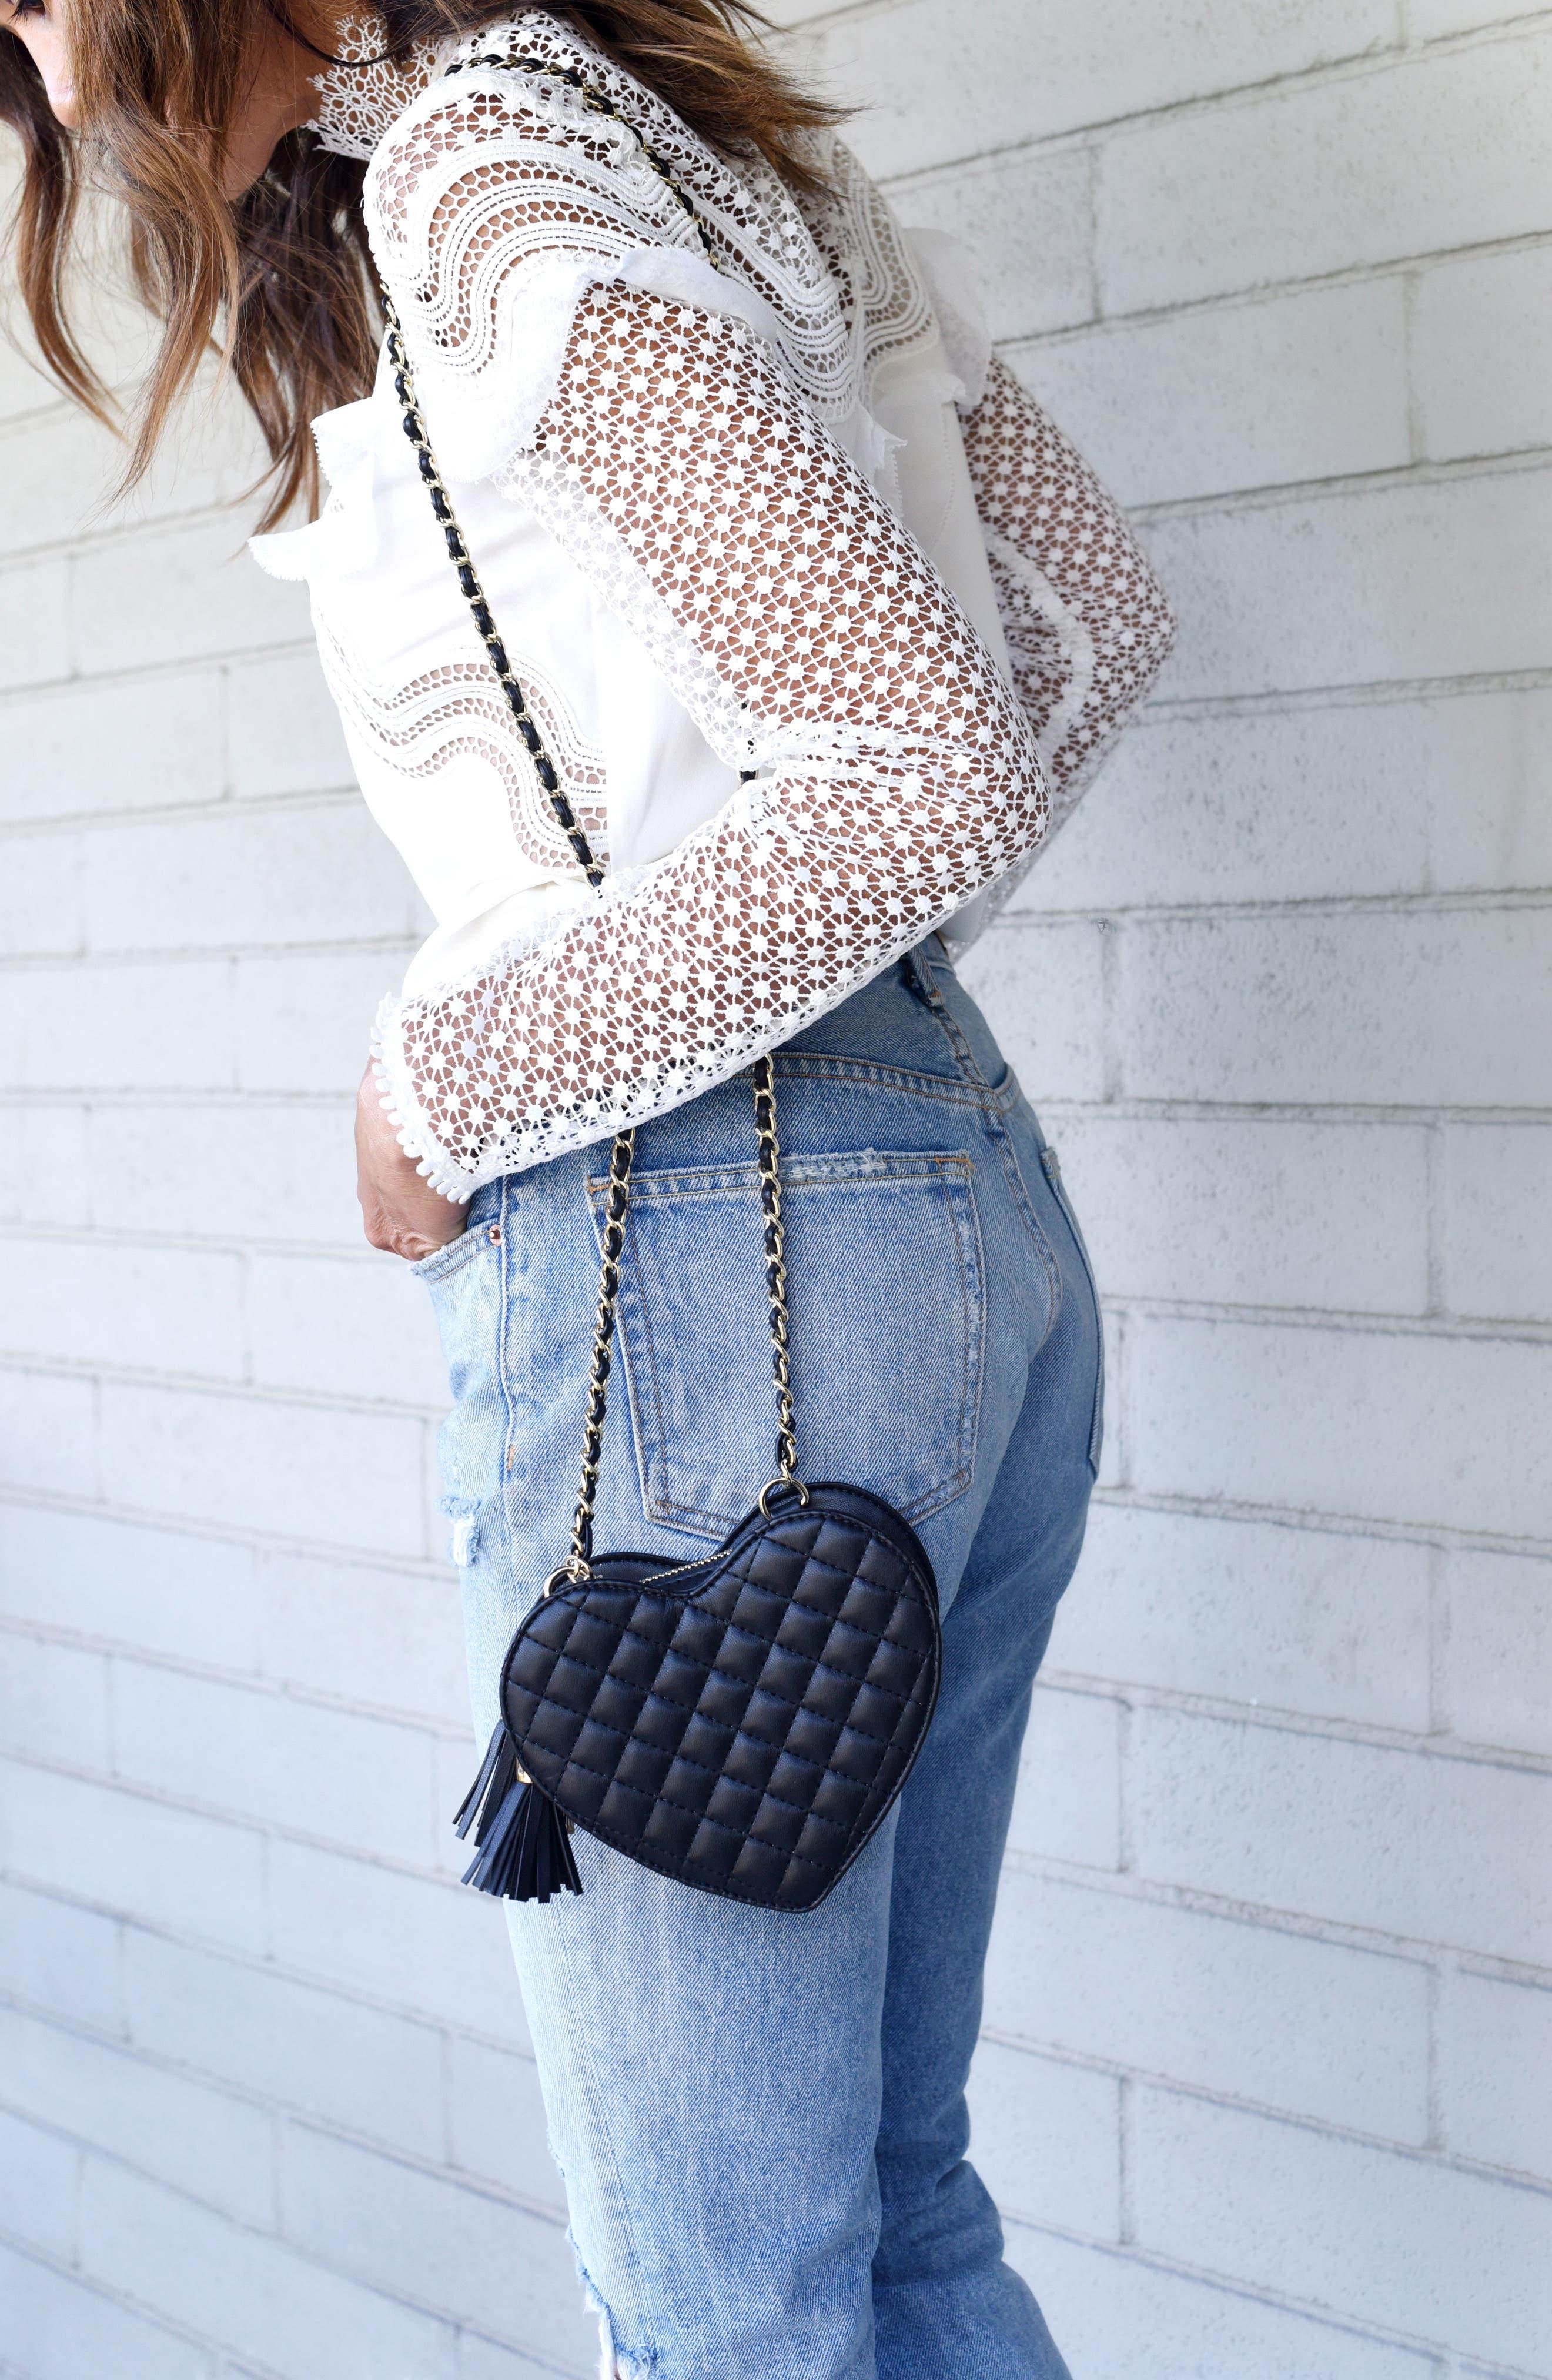 Mali + Lili Quilted Heart Vegan Leather Crossbody Bag,                             Alternate thumbnail 8, color,                             Black